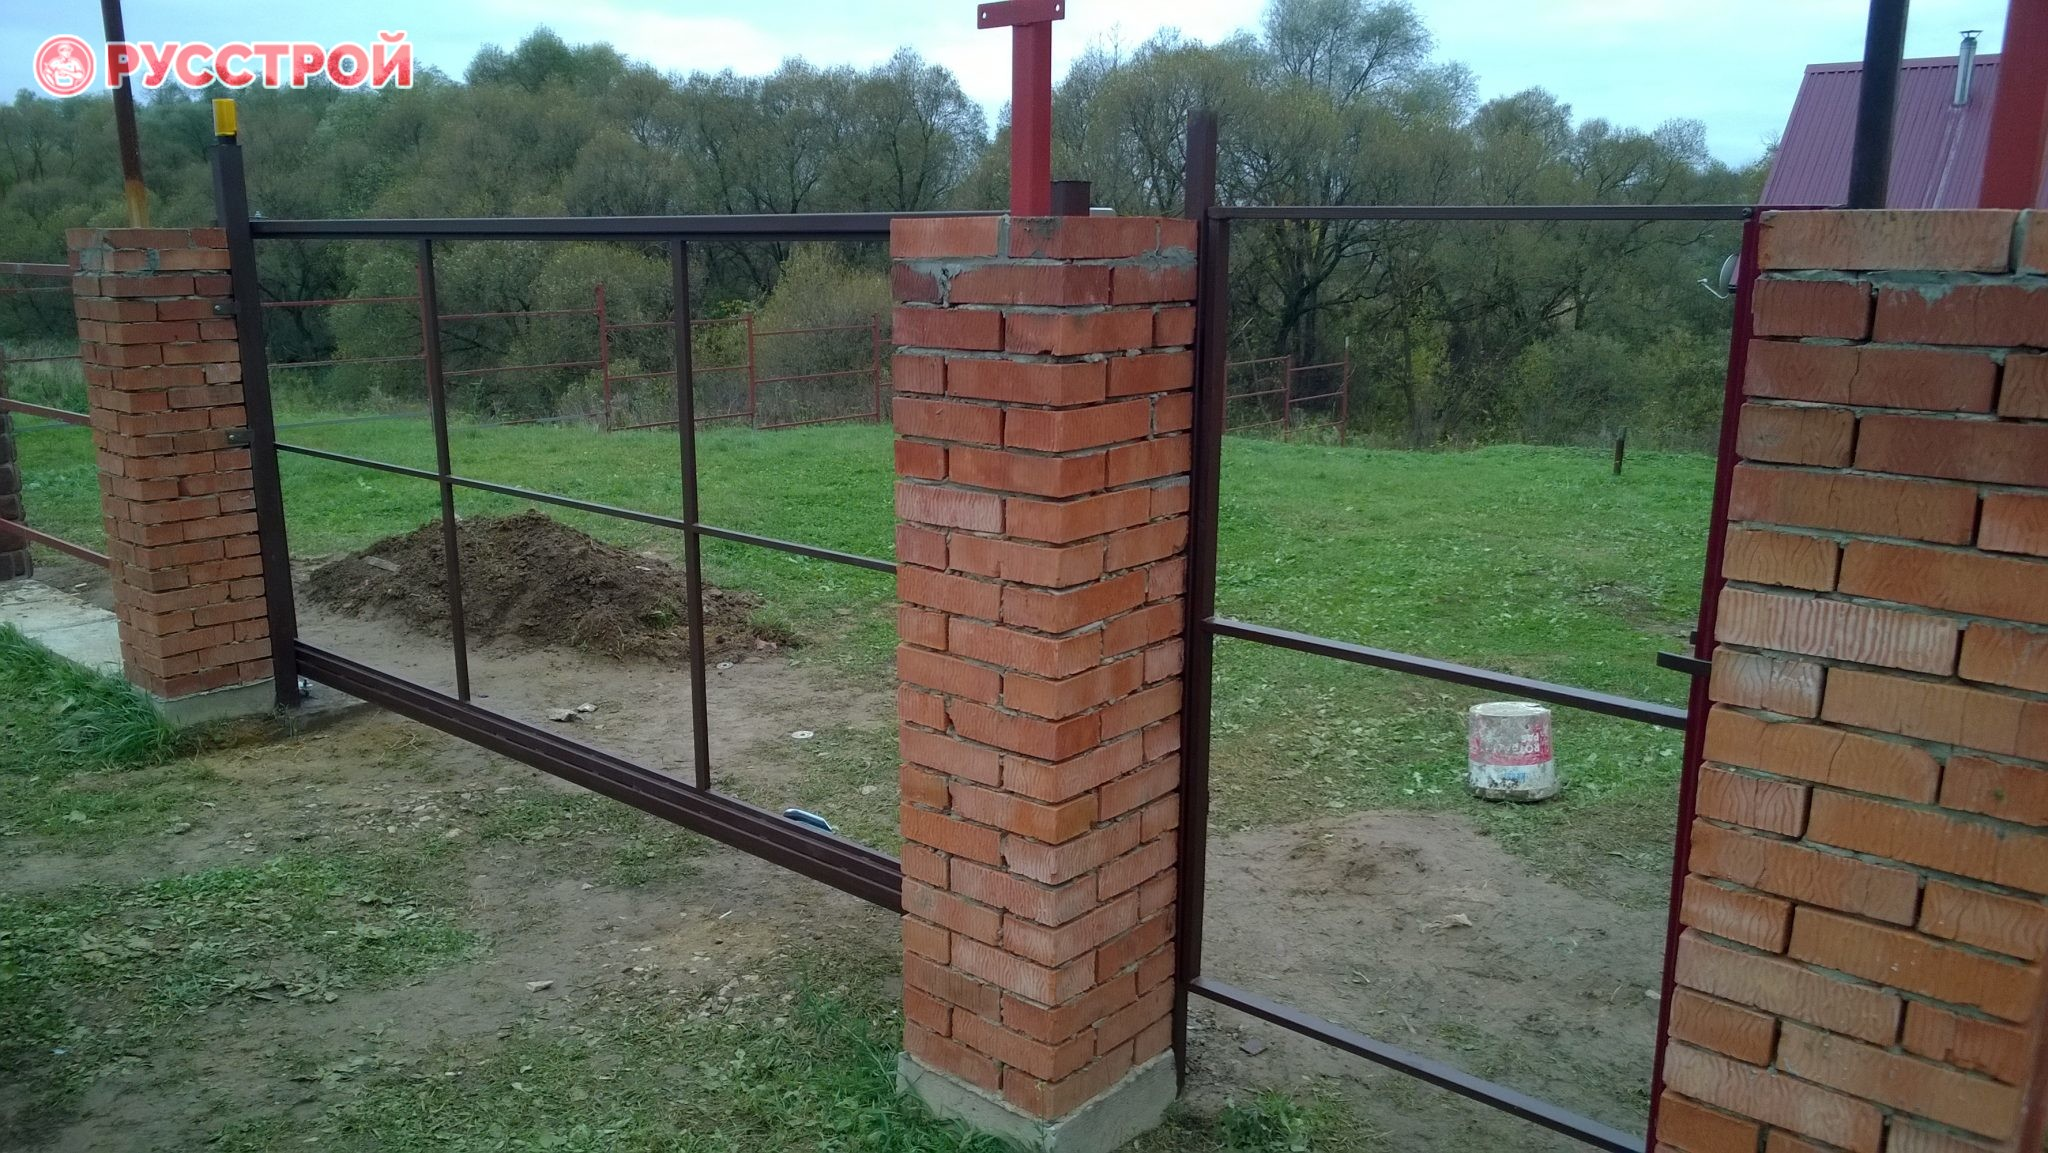 Сварка каркаса ворот и калитки